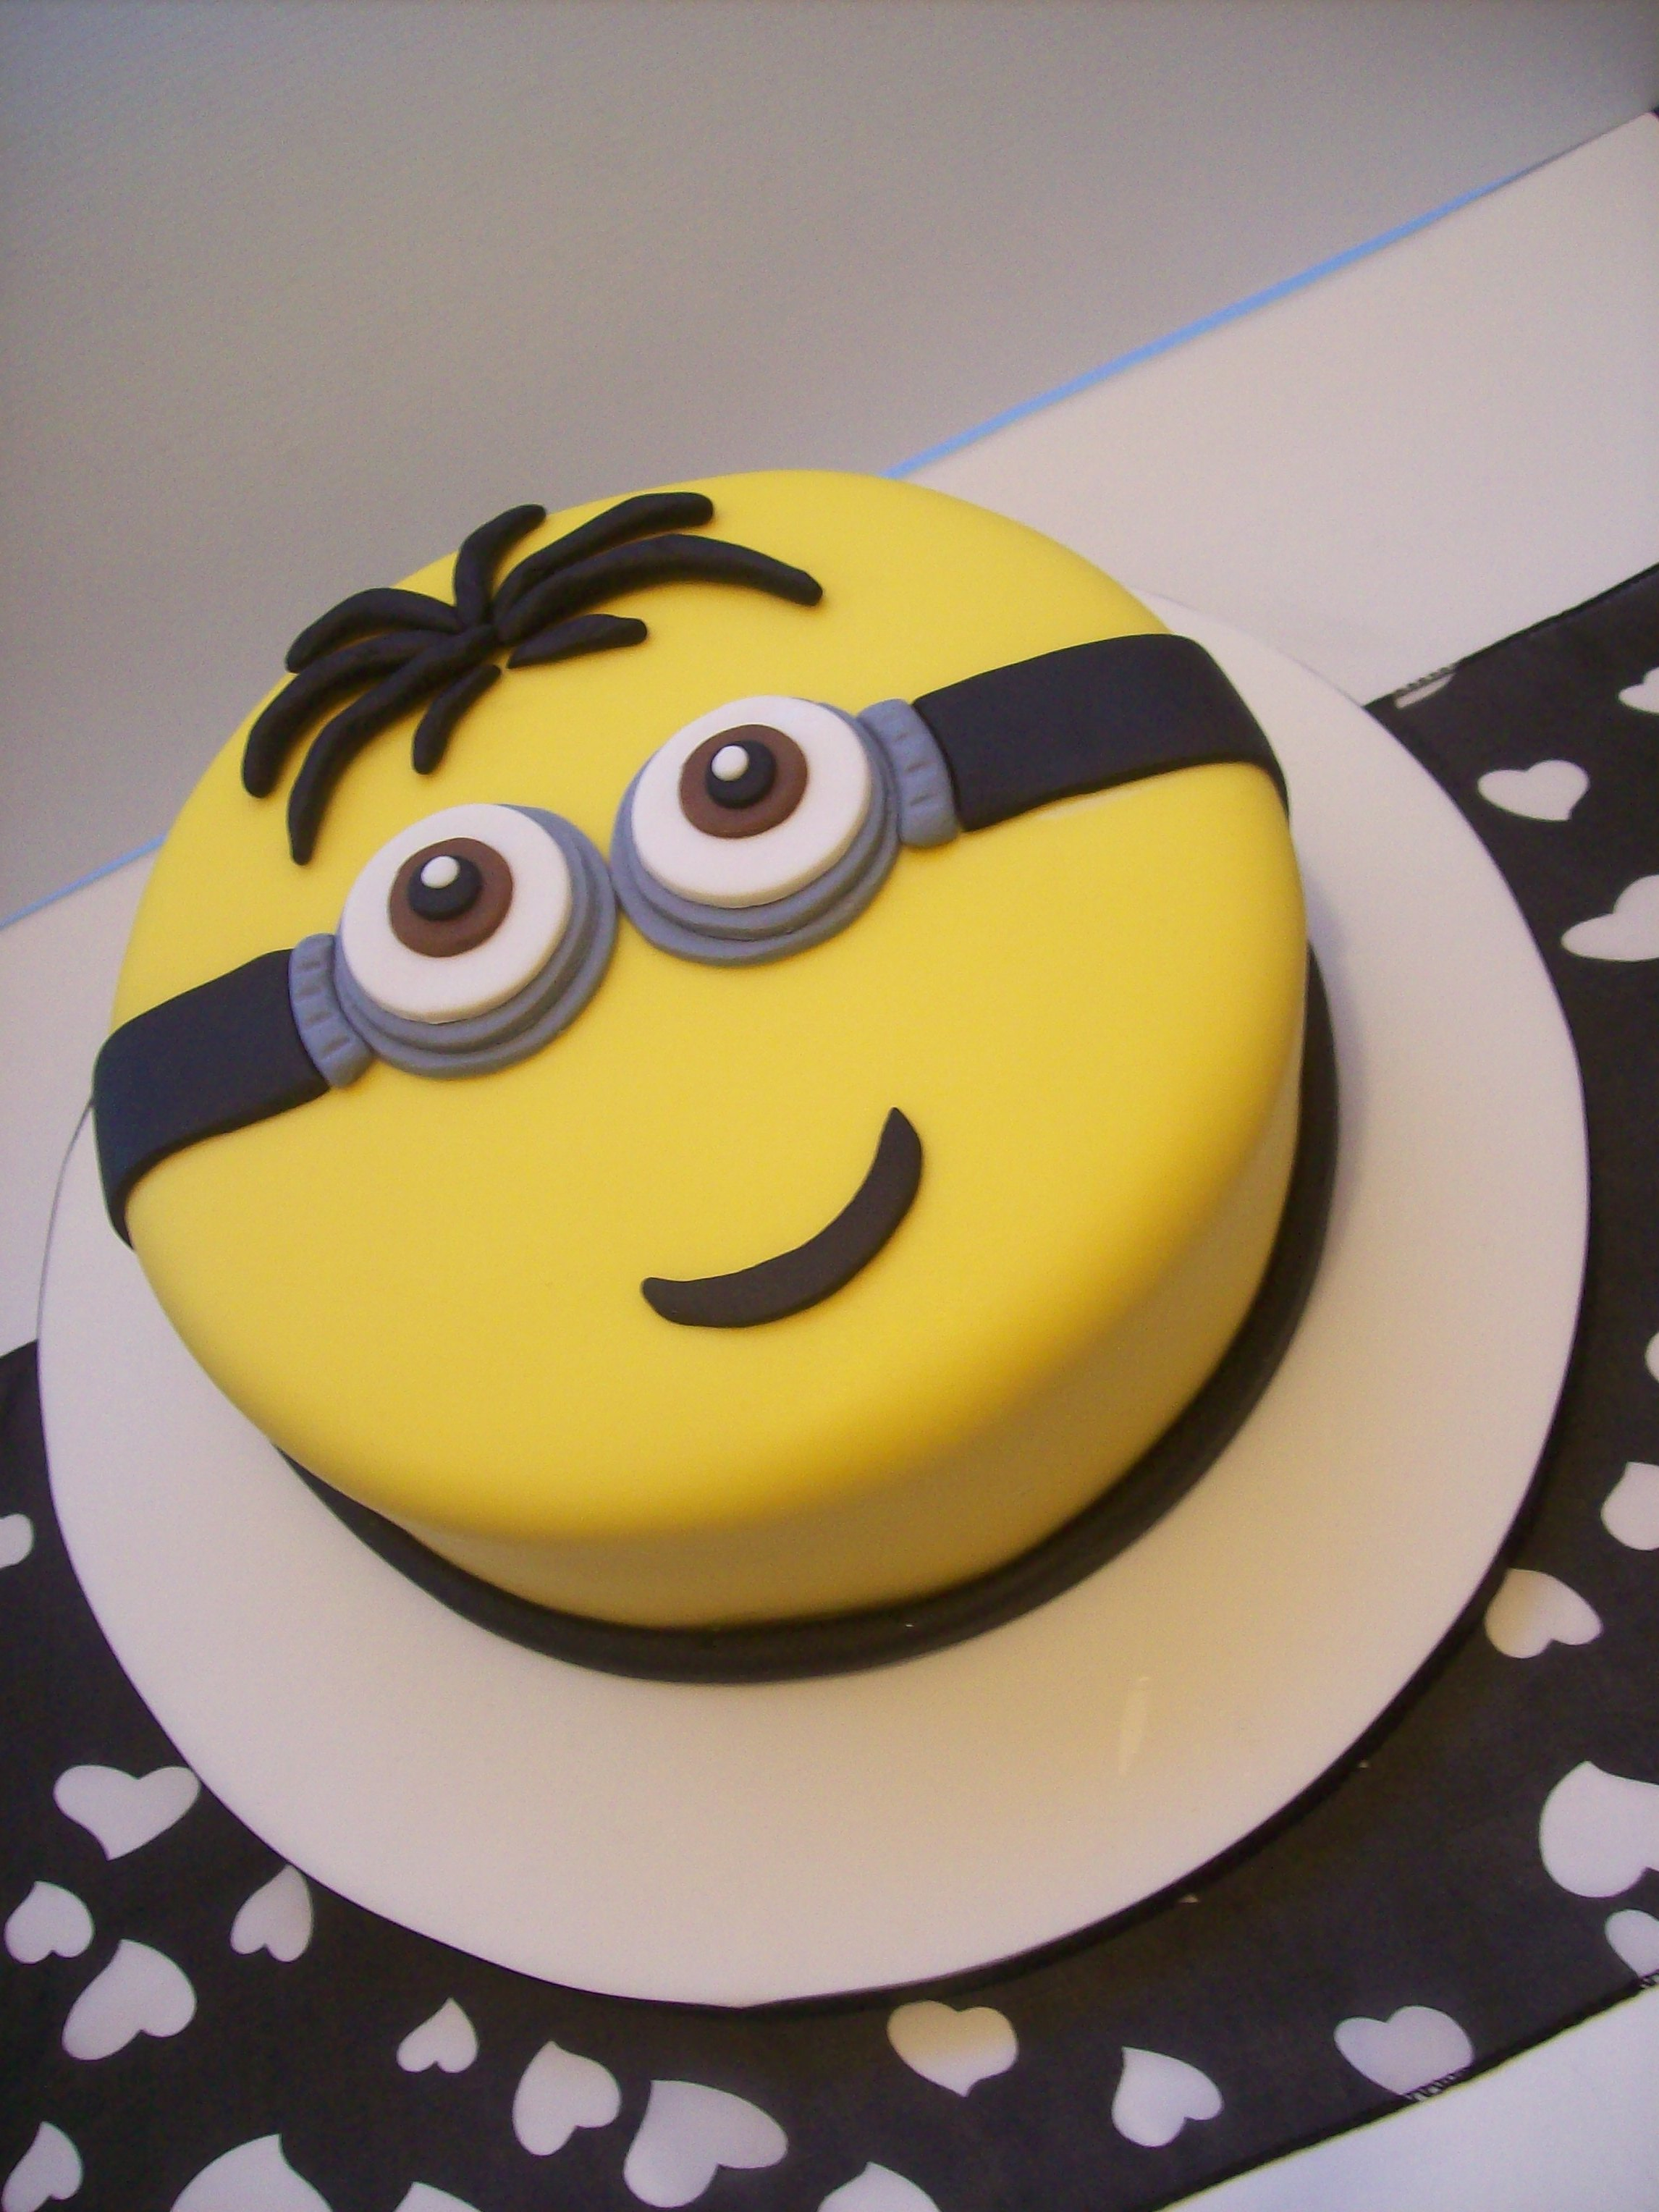 Minions Cake 8 Inch 179 Temptation Cakes Temptation Cakes